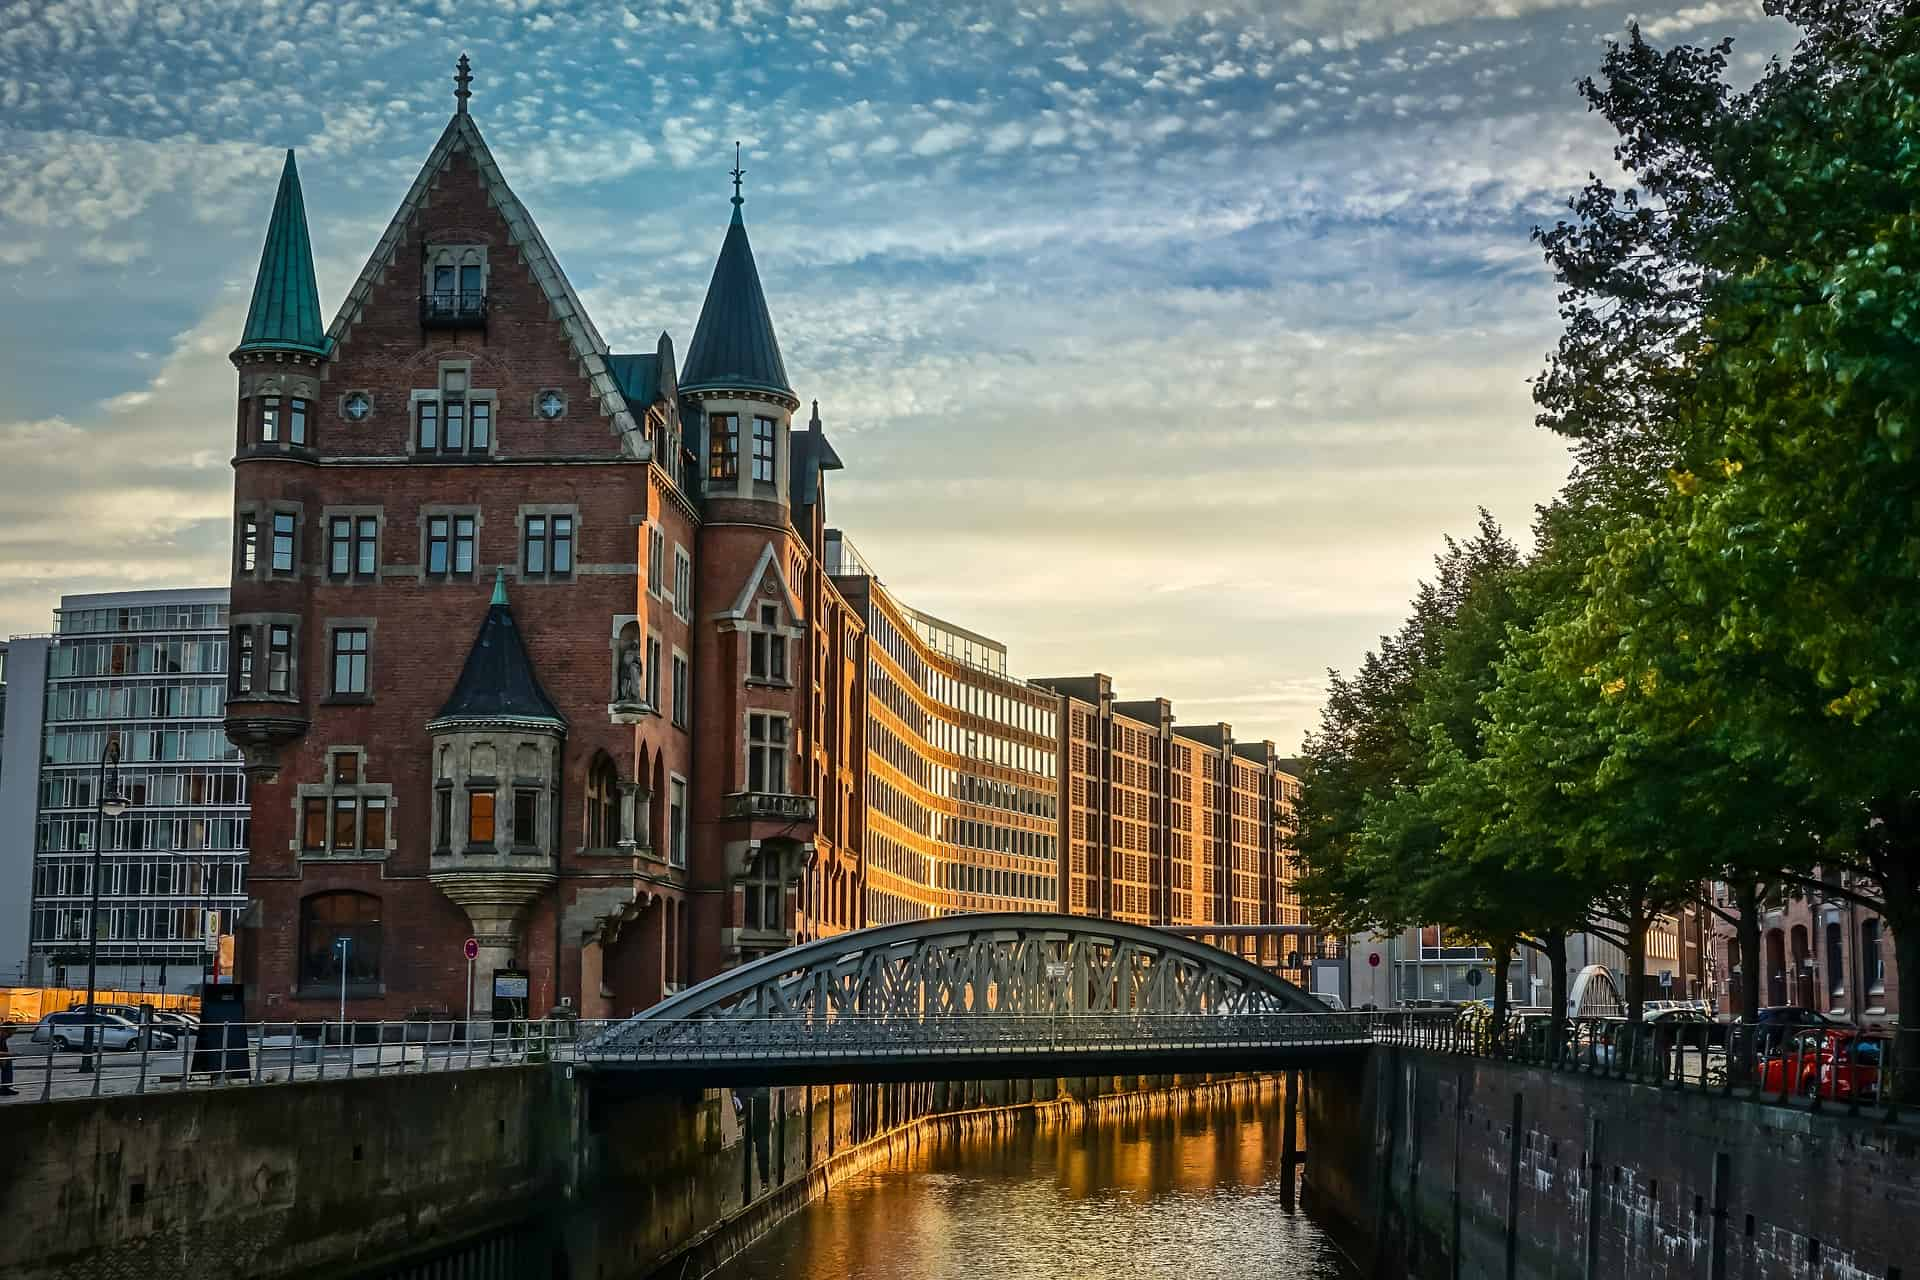 Miniatur Wunderland Hamburg + Hotel Modeleisenbahn